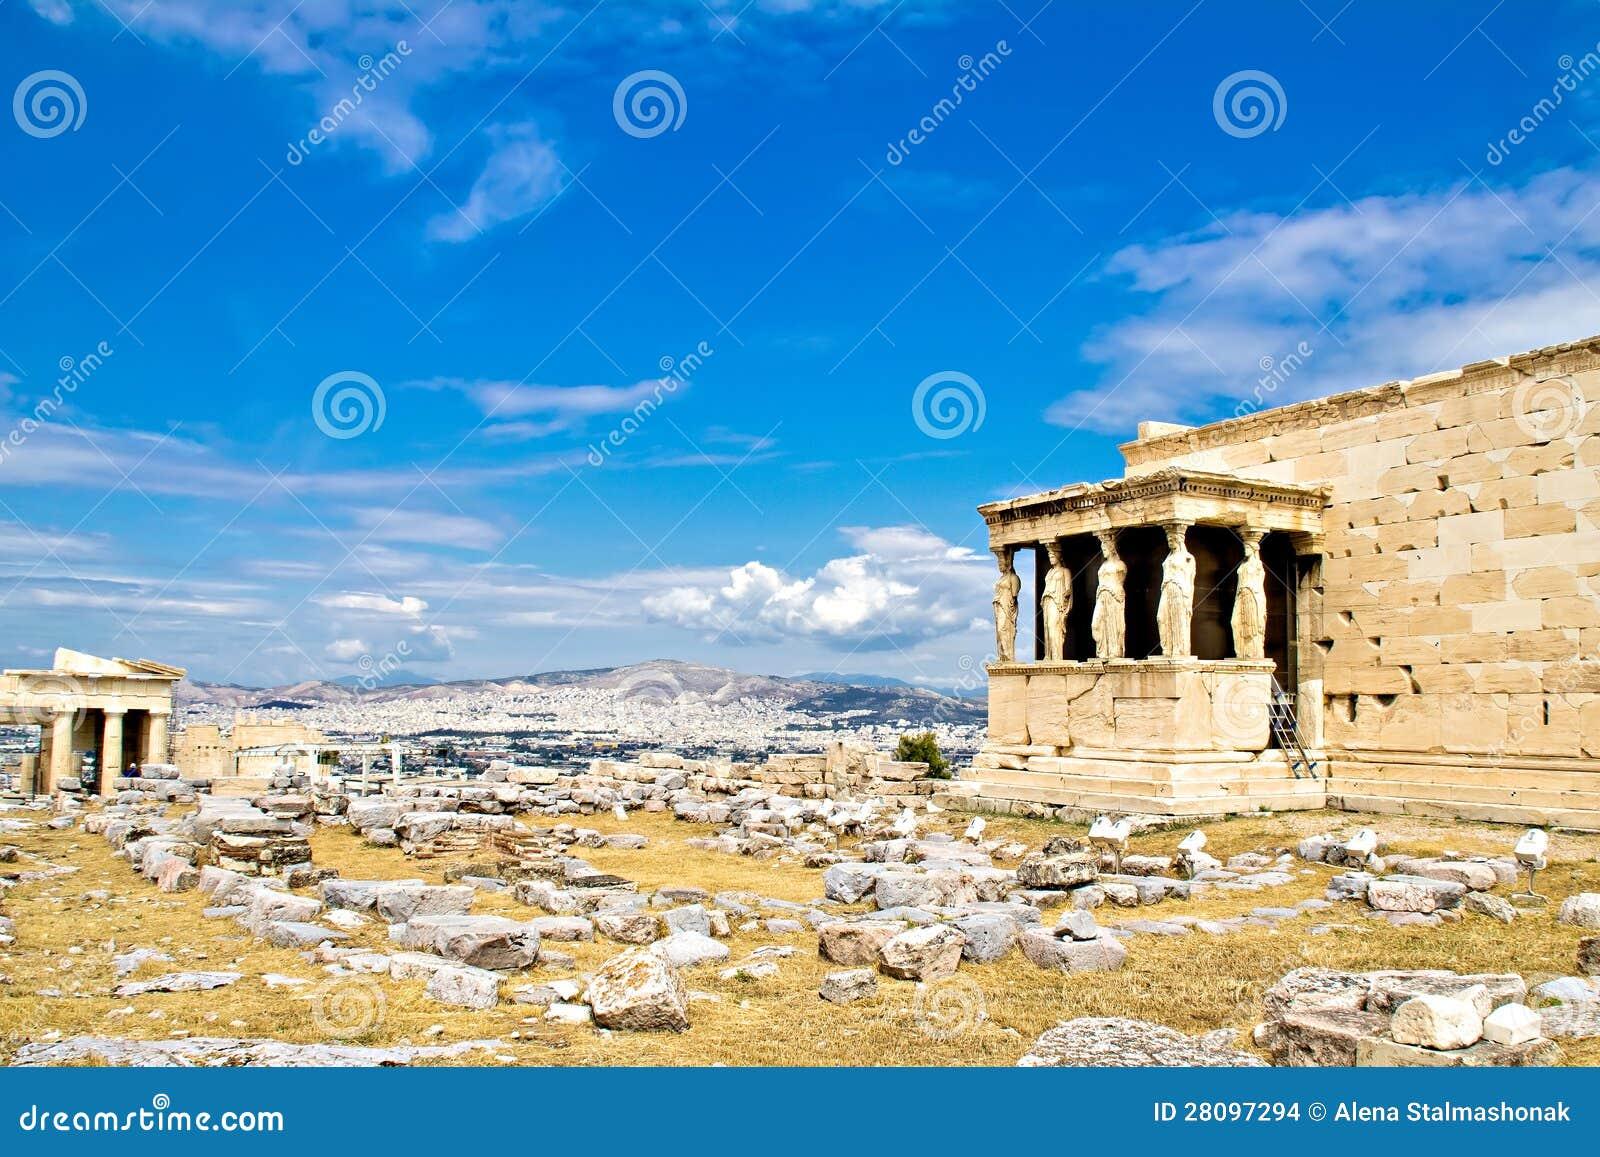 Caryatids Erechtheum, Acropolis, Athens, Greece